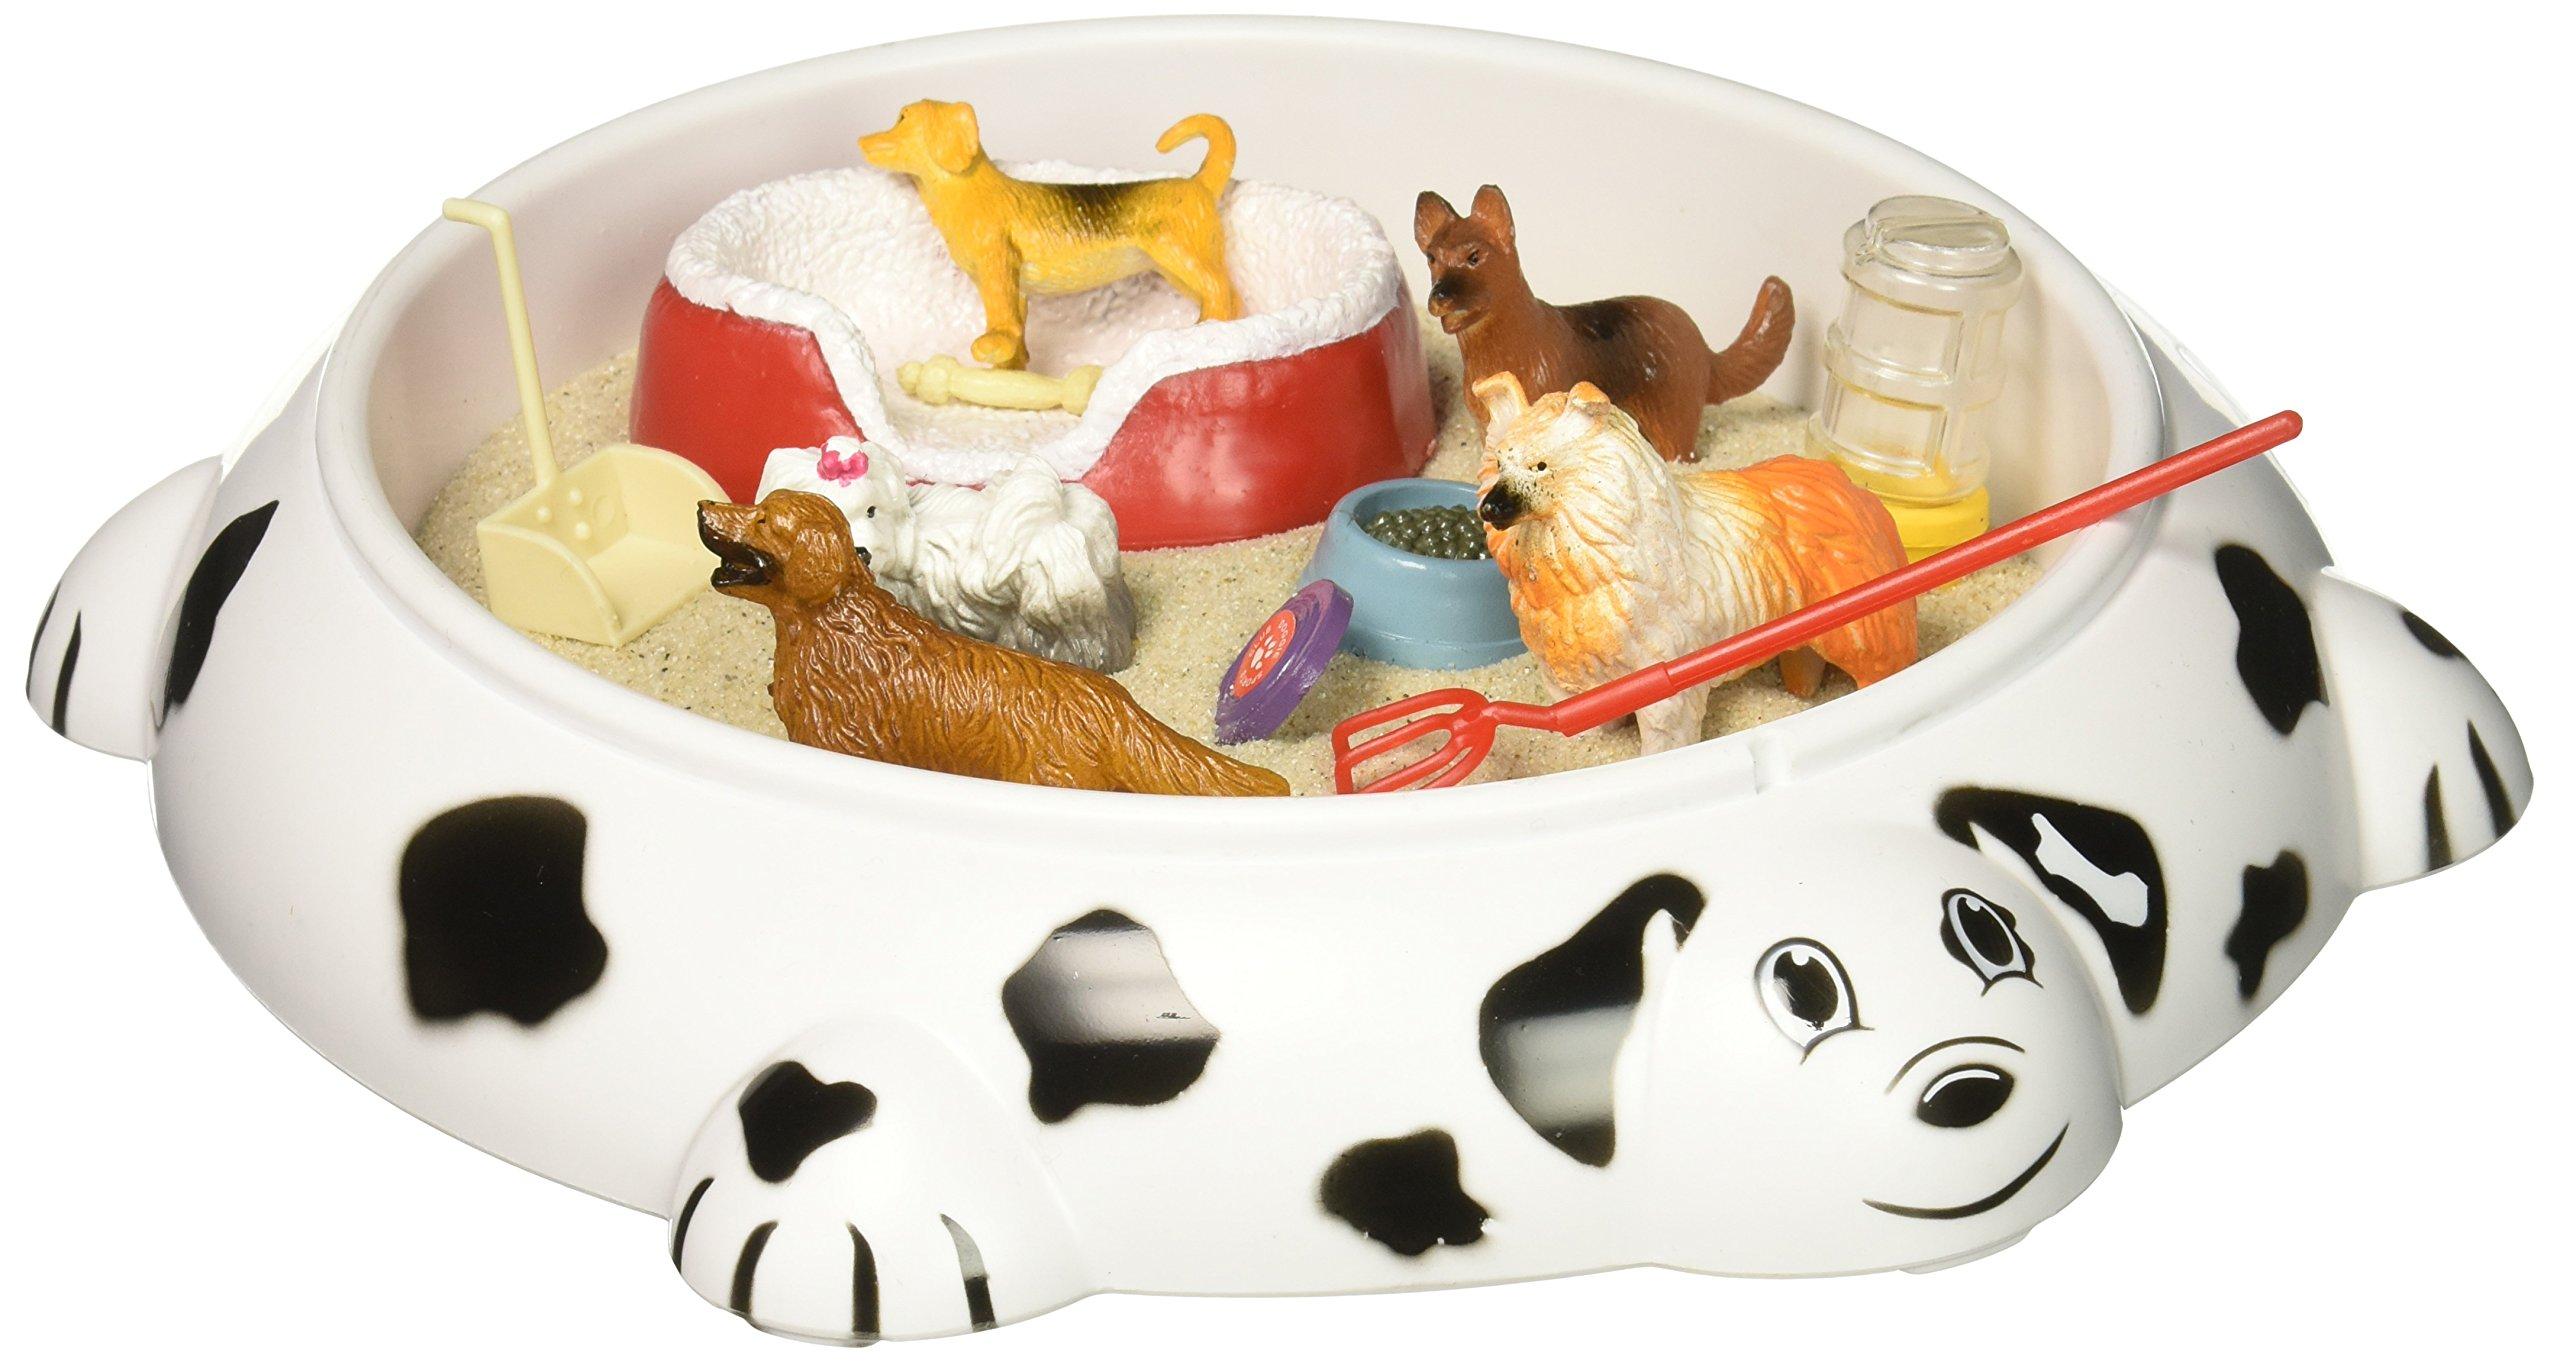 Be Good Company Critters Dalmatian Sandbox Play Set